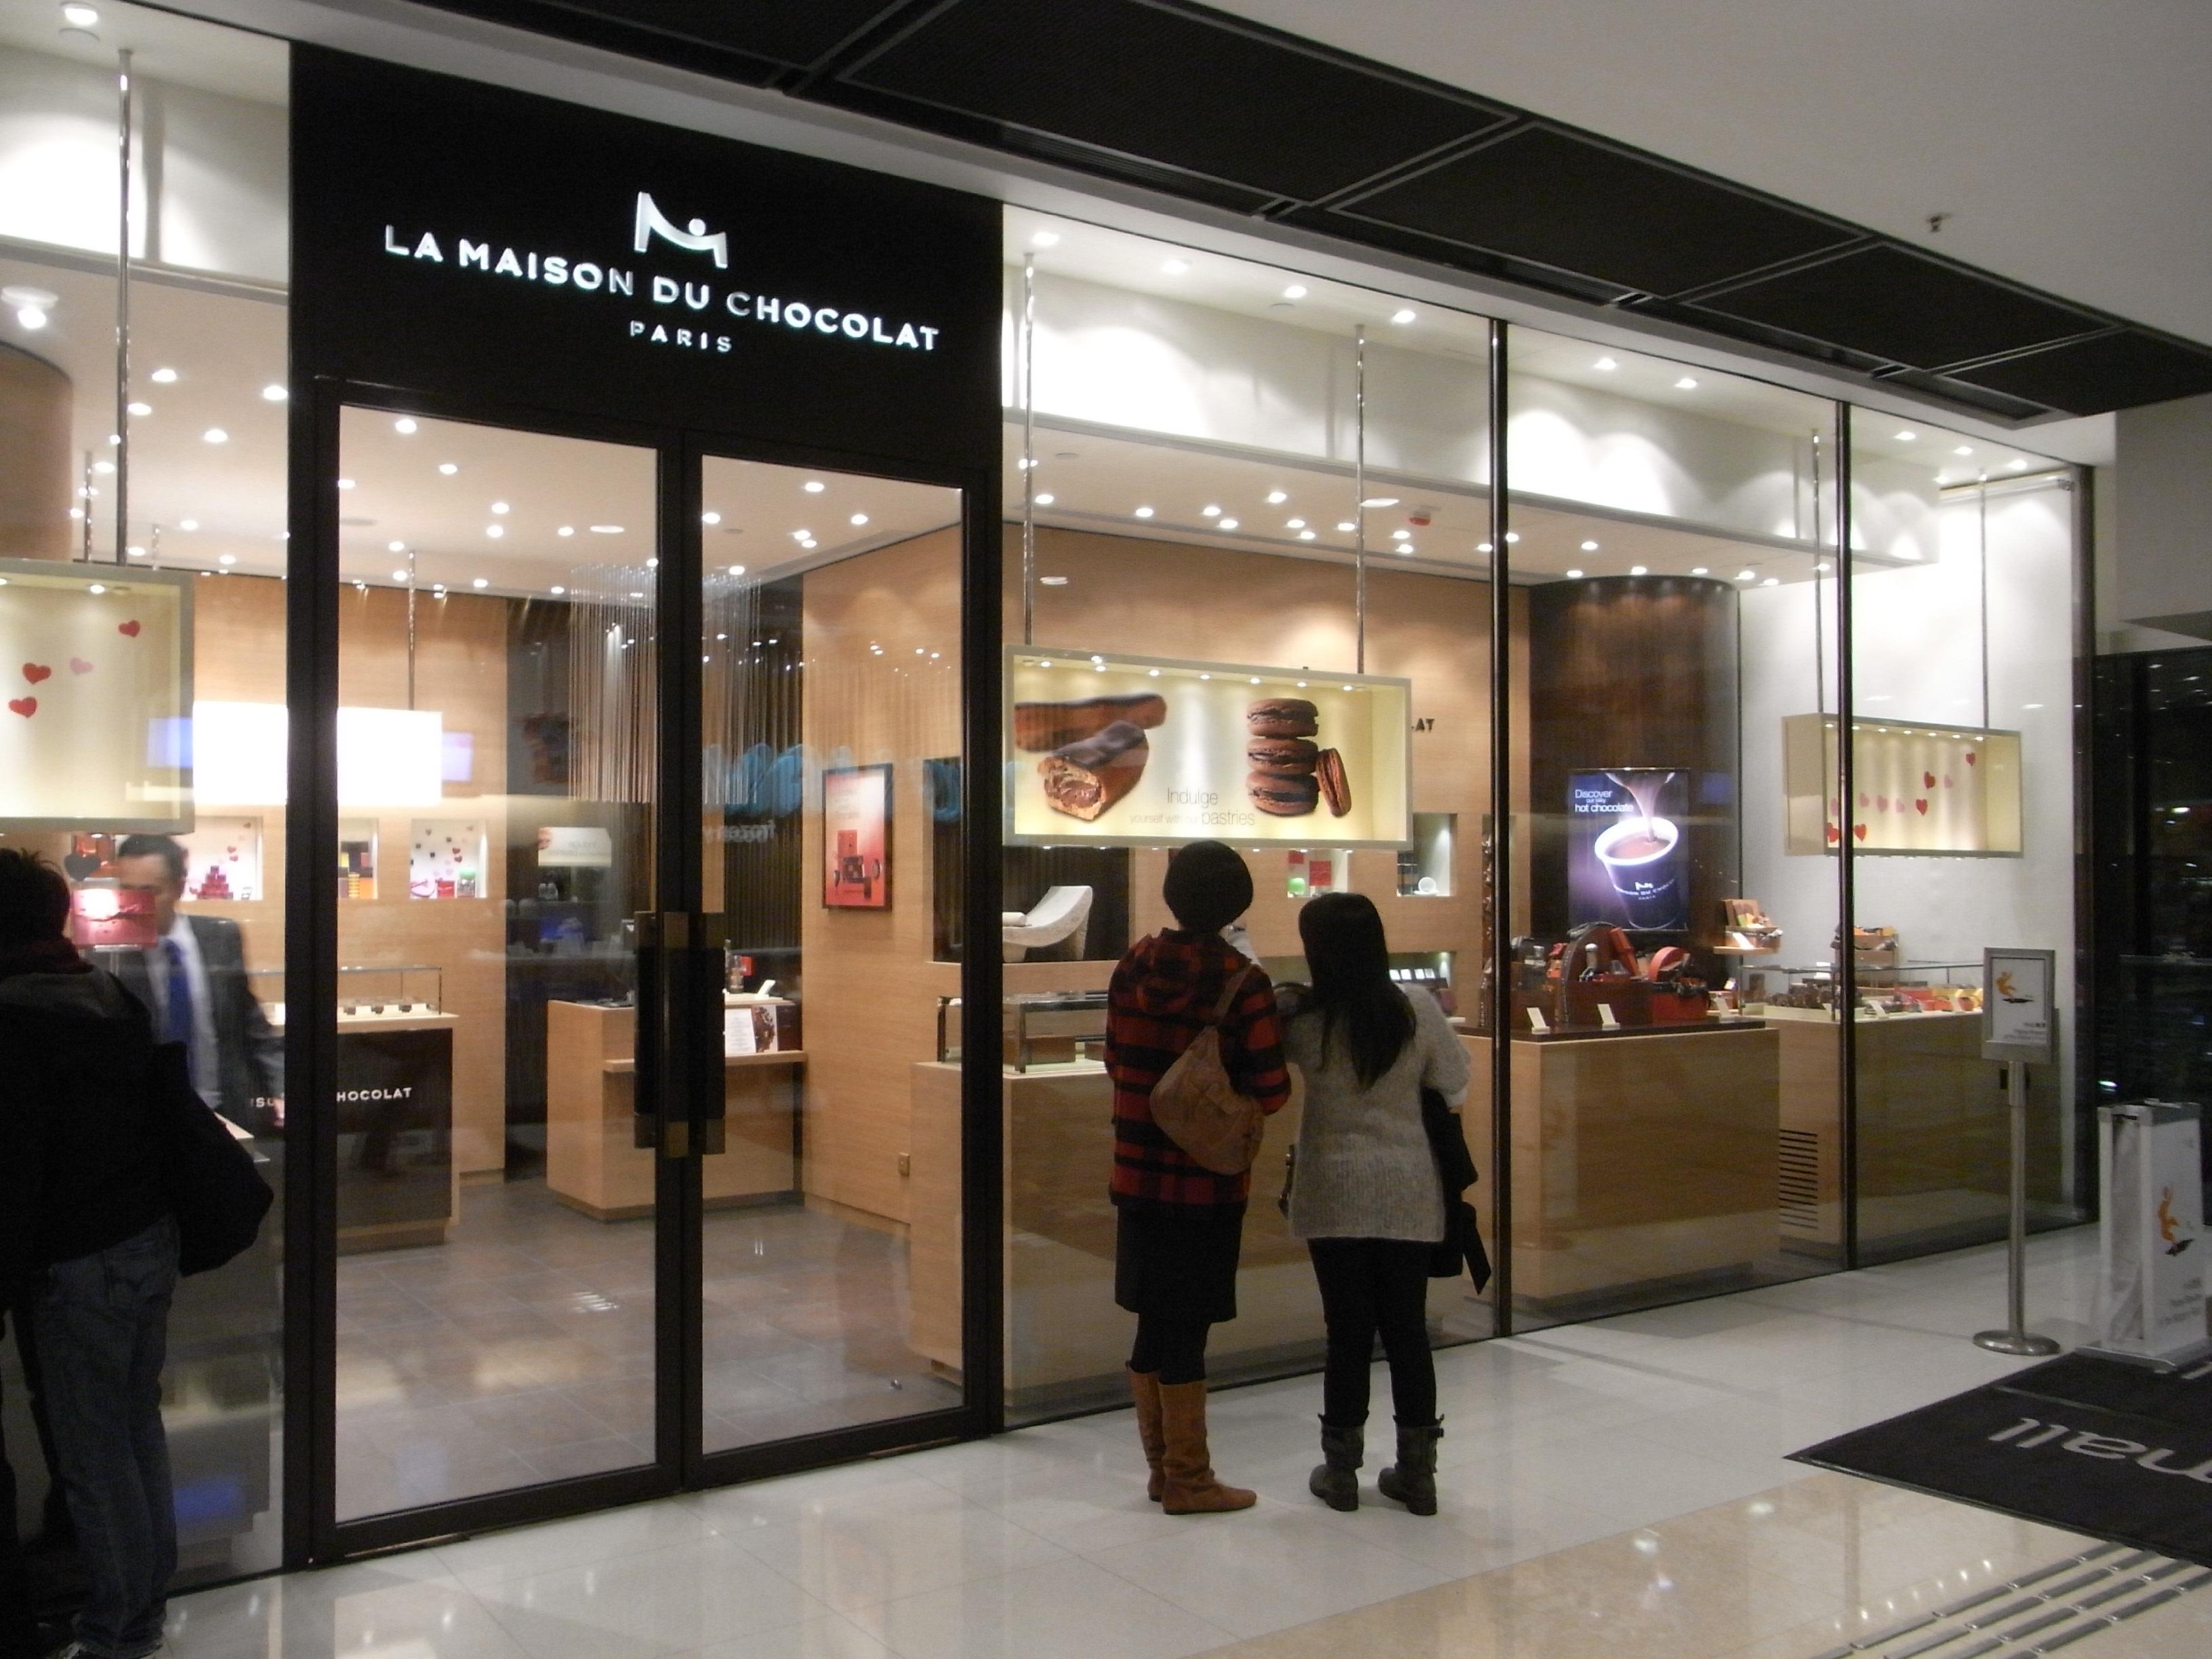 https commons wikimedia org wiki file hk central night ifc mall shop 1050 la maison du chocolat paris jpg